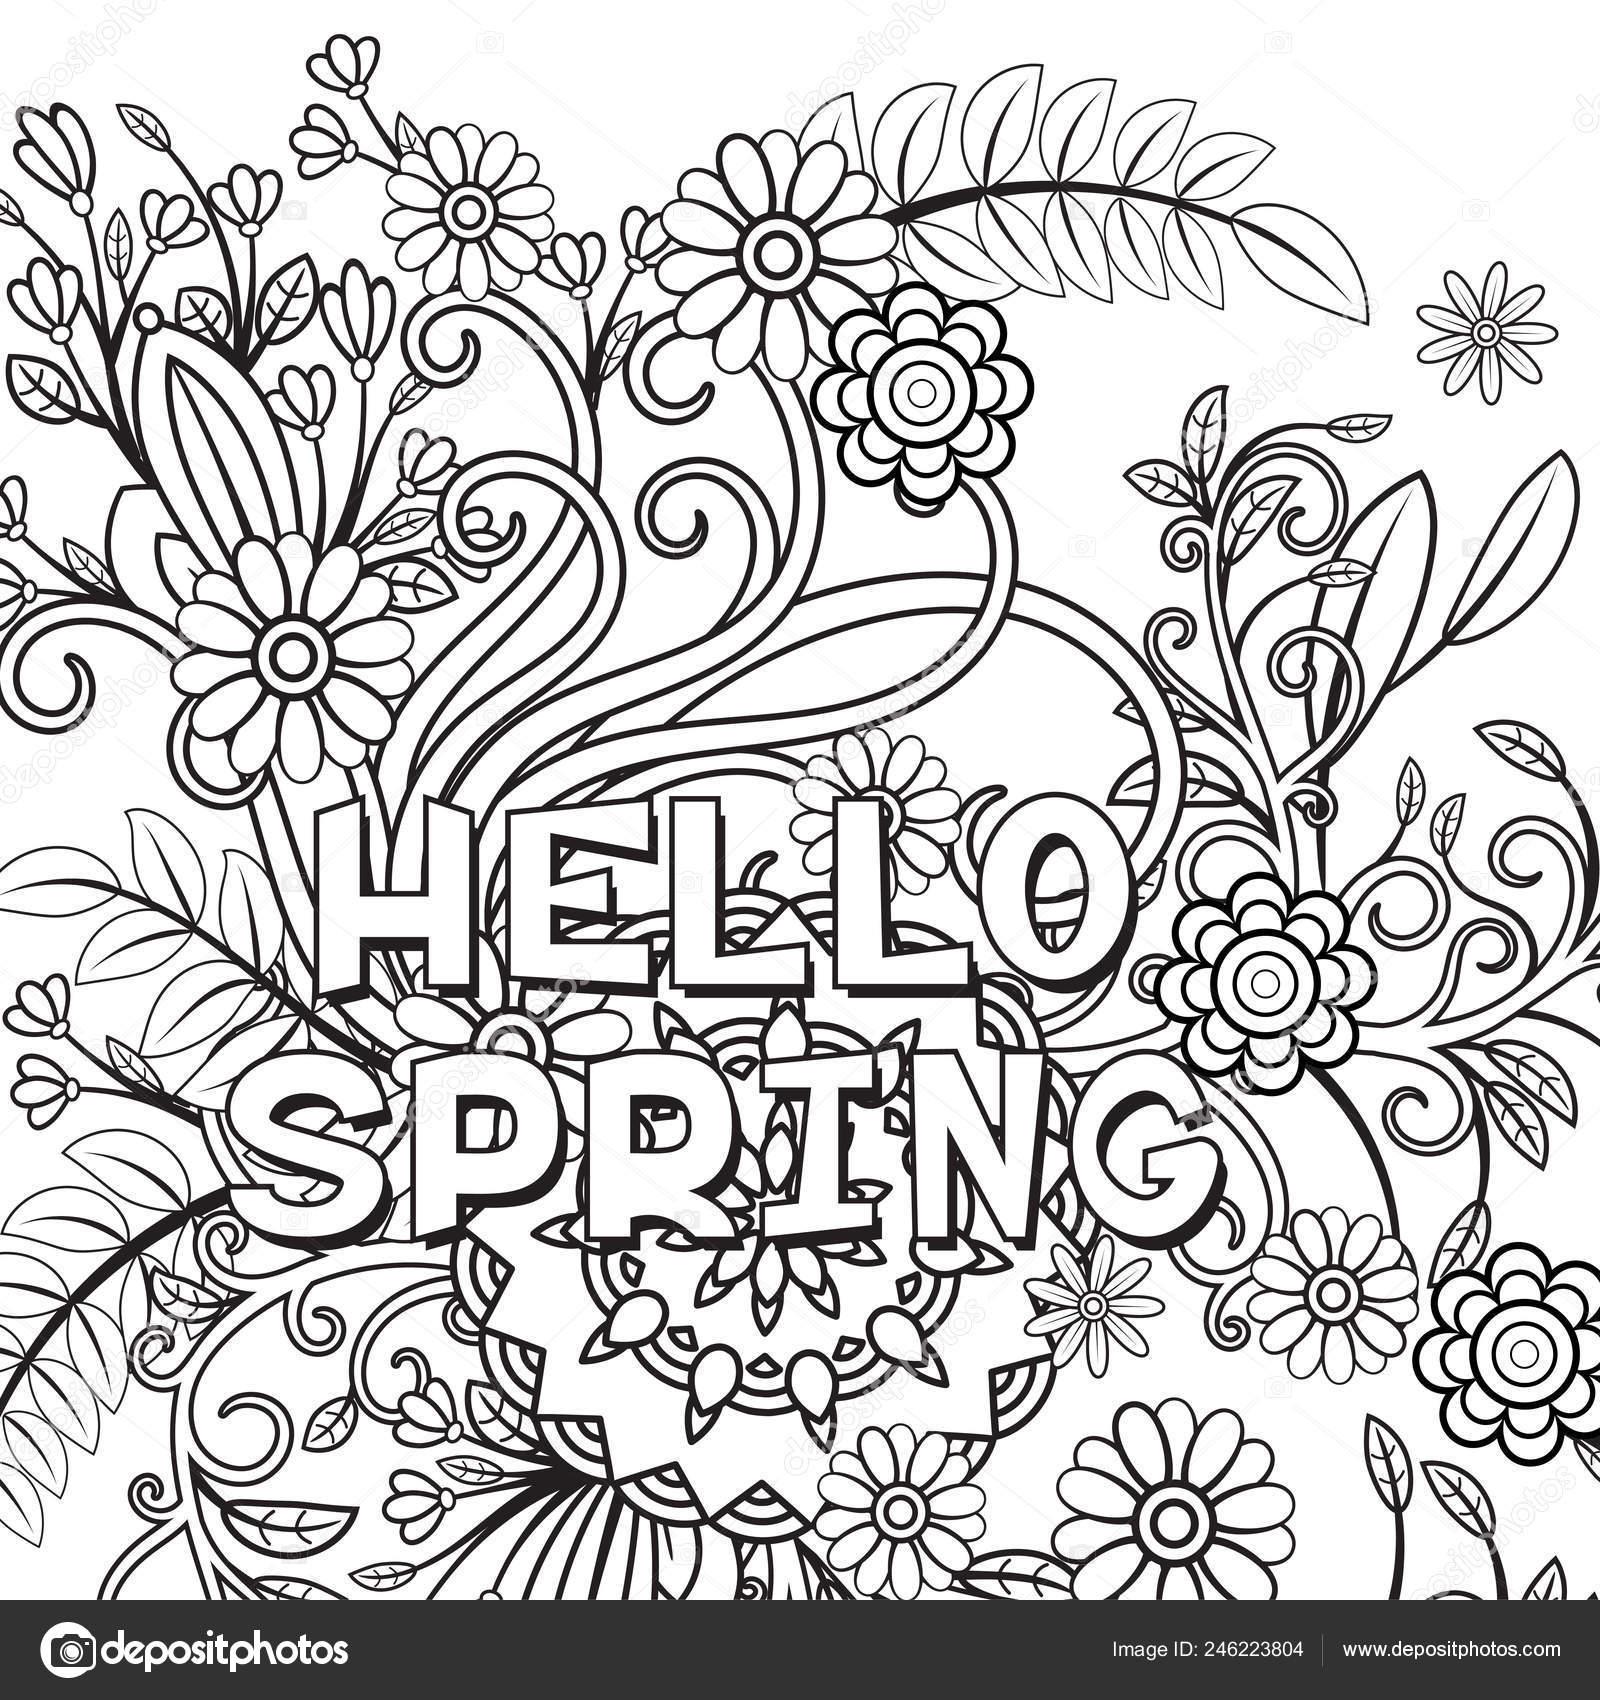 Spring Coloring Page - Free Printable - AllFreePrintable.com | 1700x1600